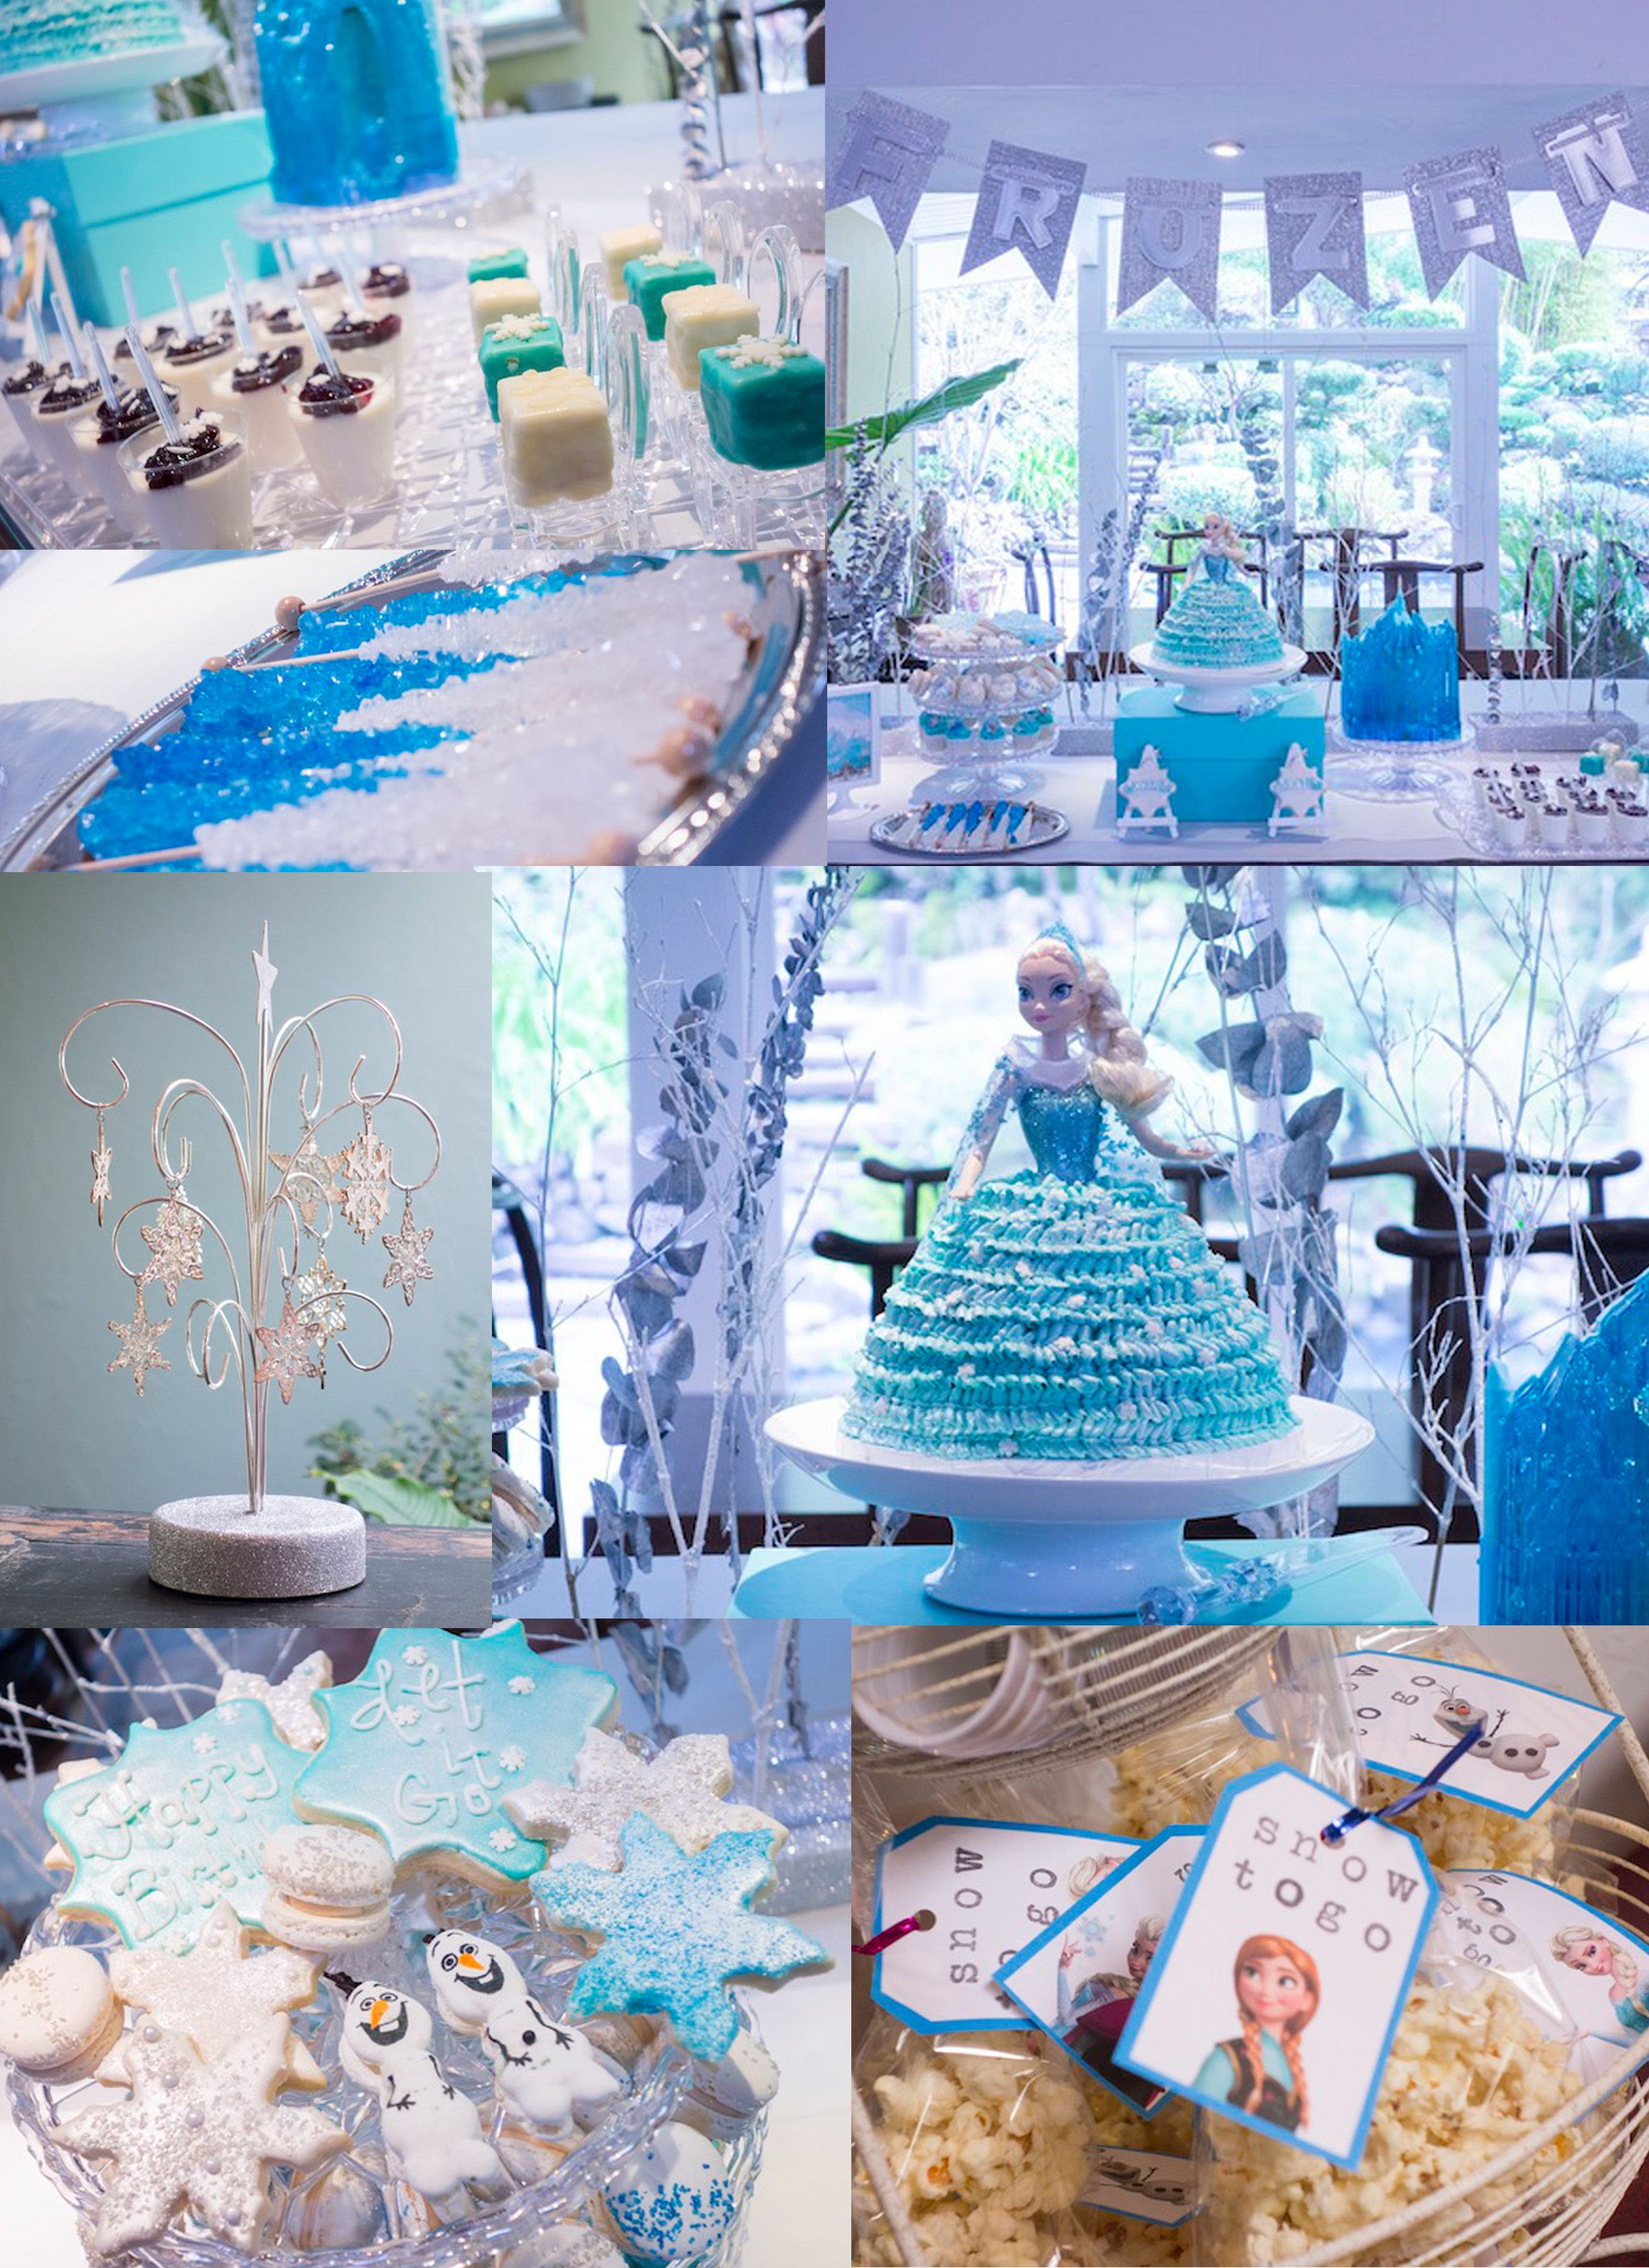 Frozen Birthday Party Ideas #frozen #birthday #party #disney #birthdayparty #frozenparty